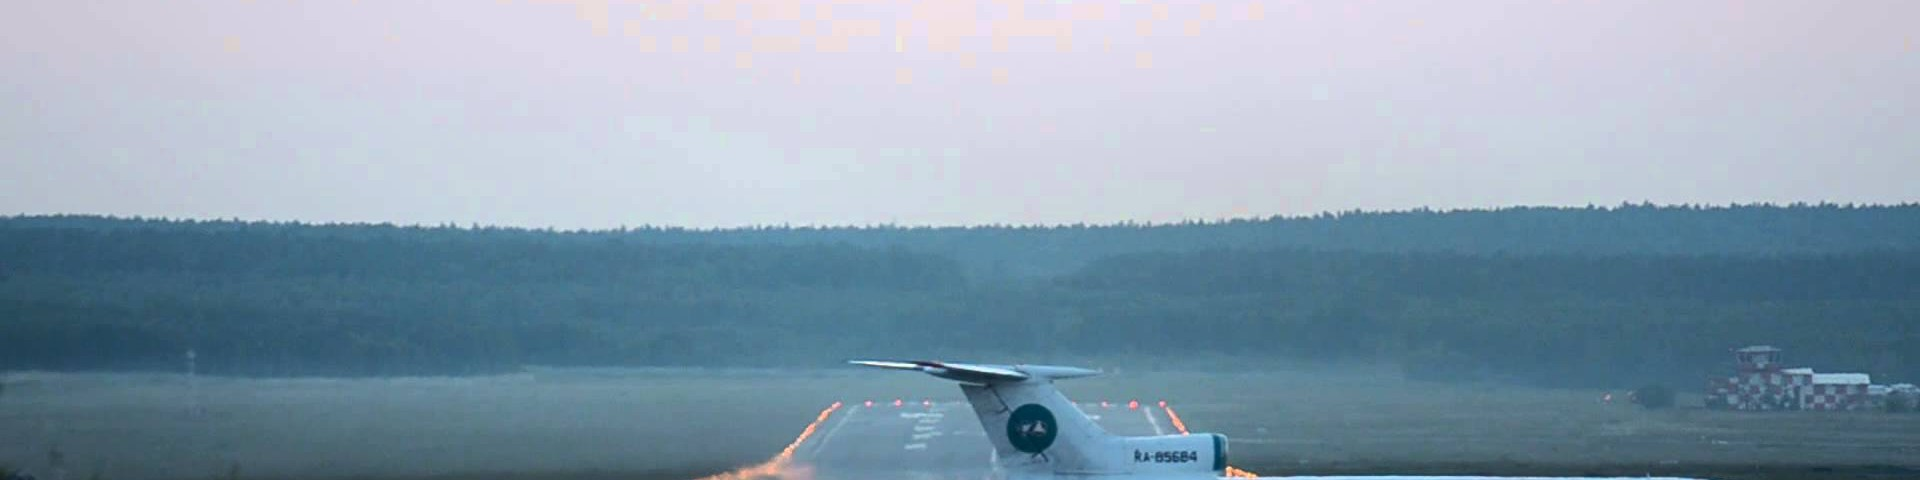 Ту-154 авиакомпании Алроса